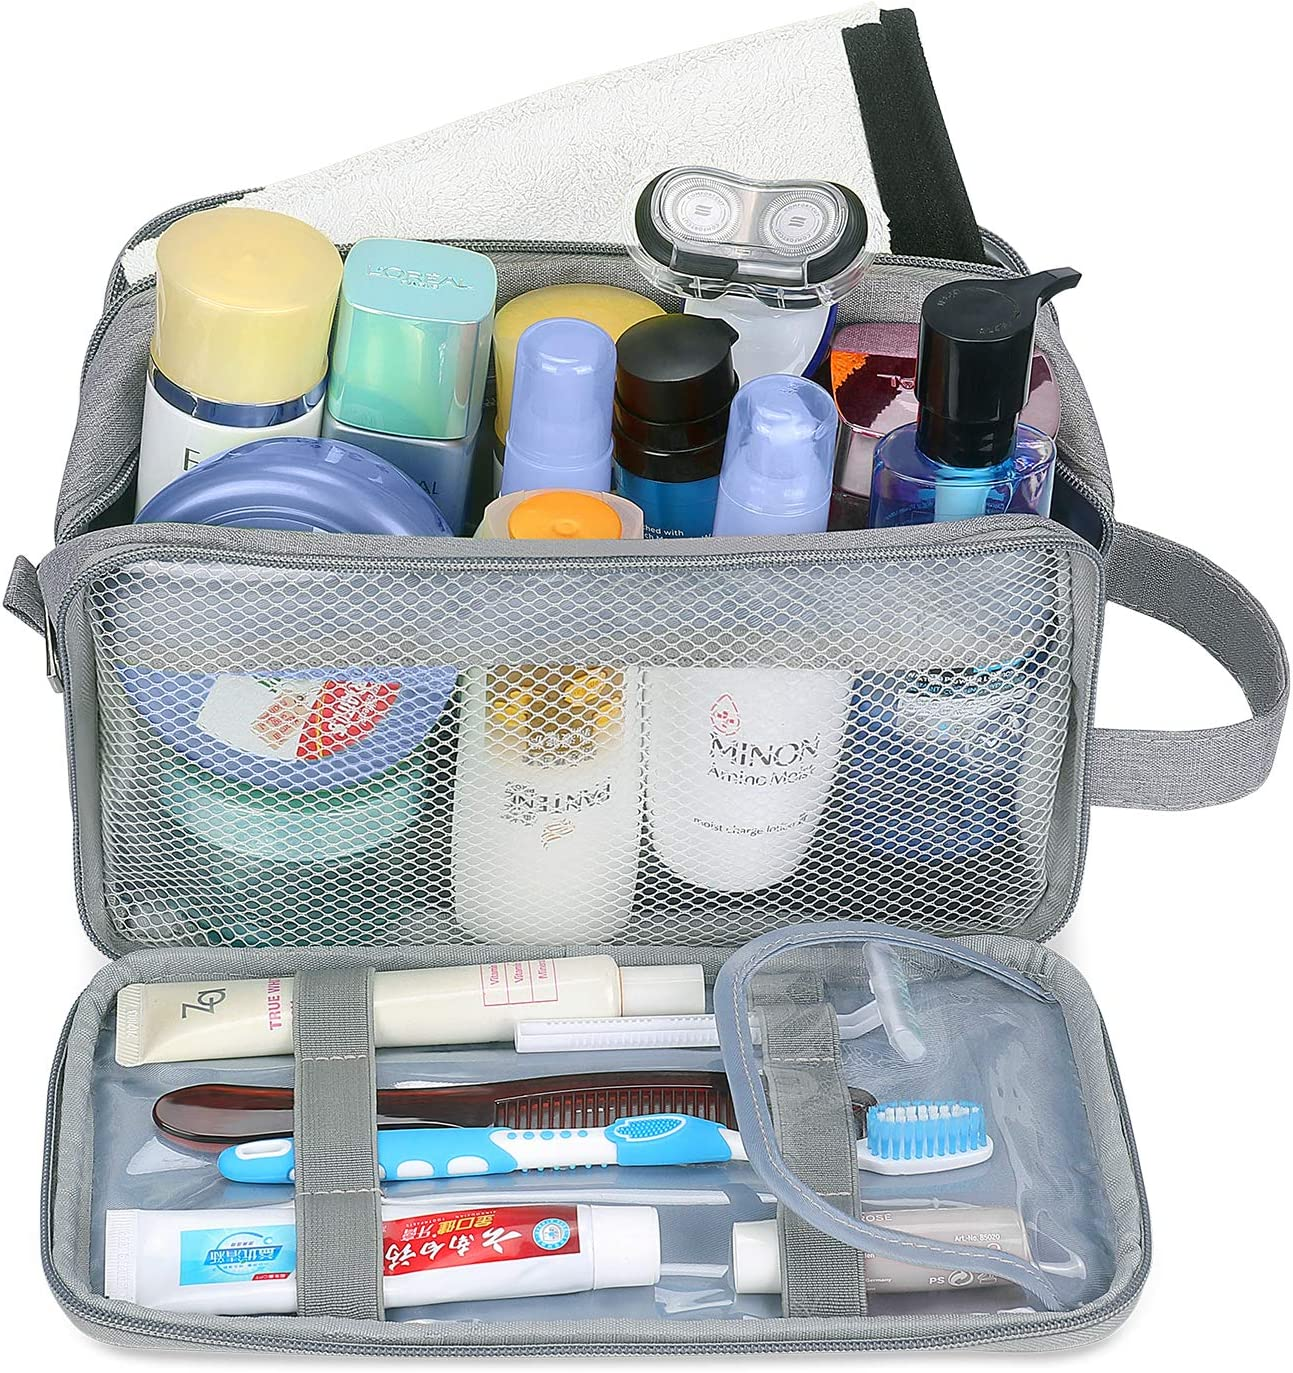 Neceseres para Maquillaje Organizador de Bolso Cosm/ético para Hombres Simboom Impermeable Bolsa de Lavado Gris Neceser de Viaje Mujeres